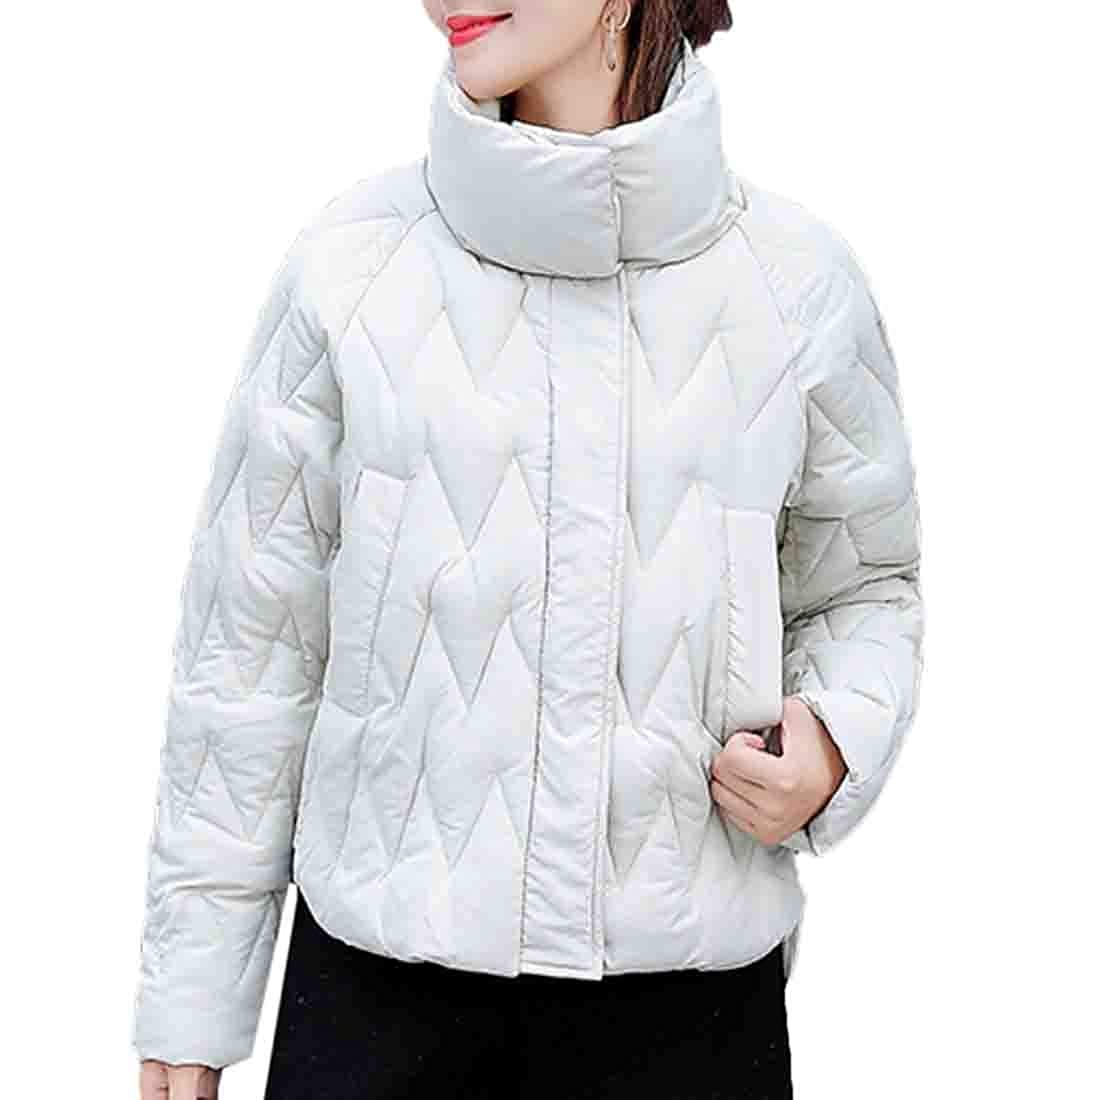 Beige Keaac Women's Coat Lightweight Puffer Down Jacket Packable Down Coats